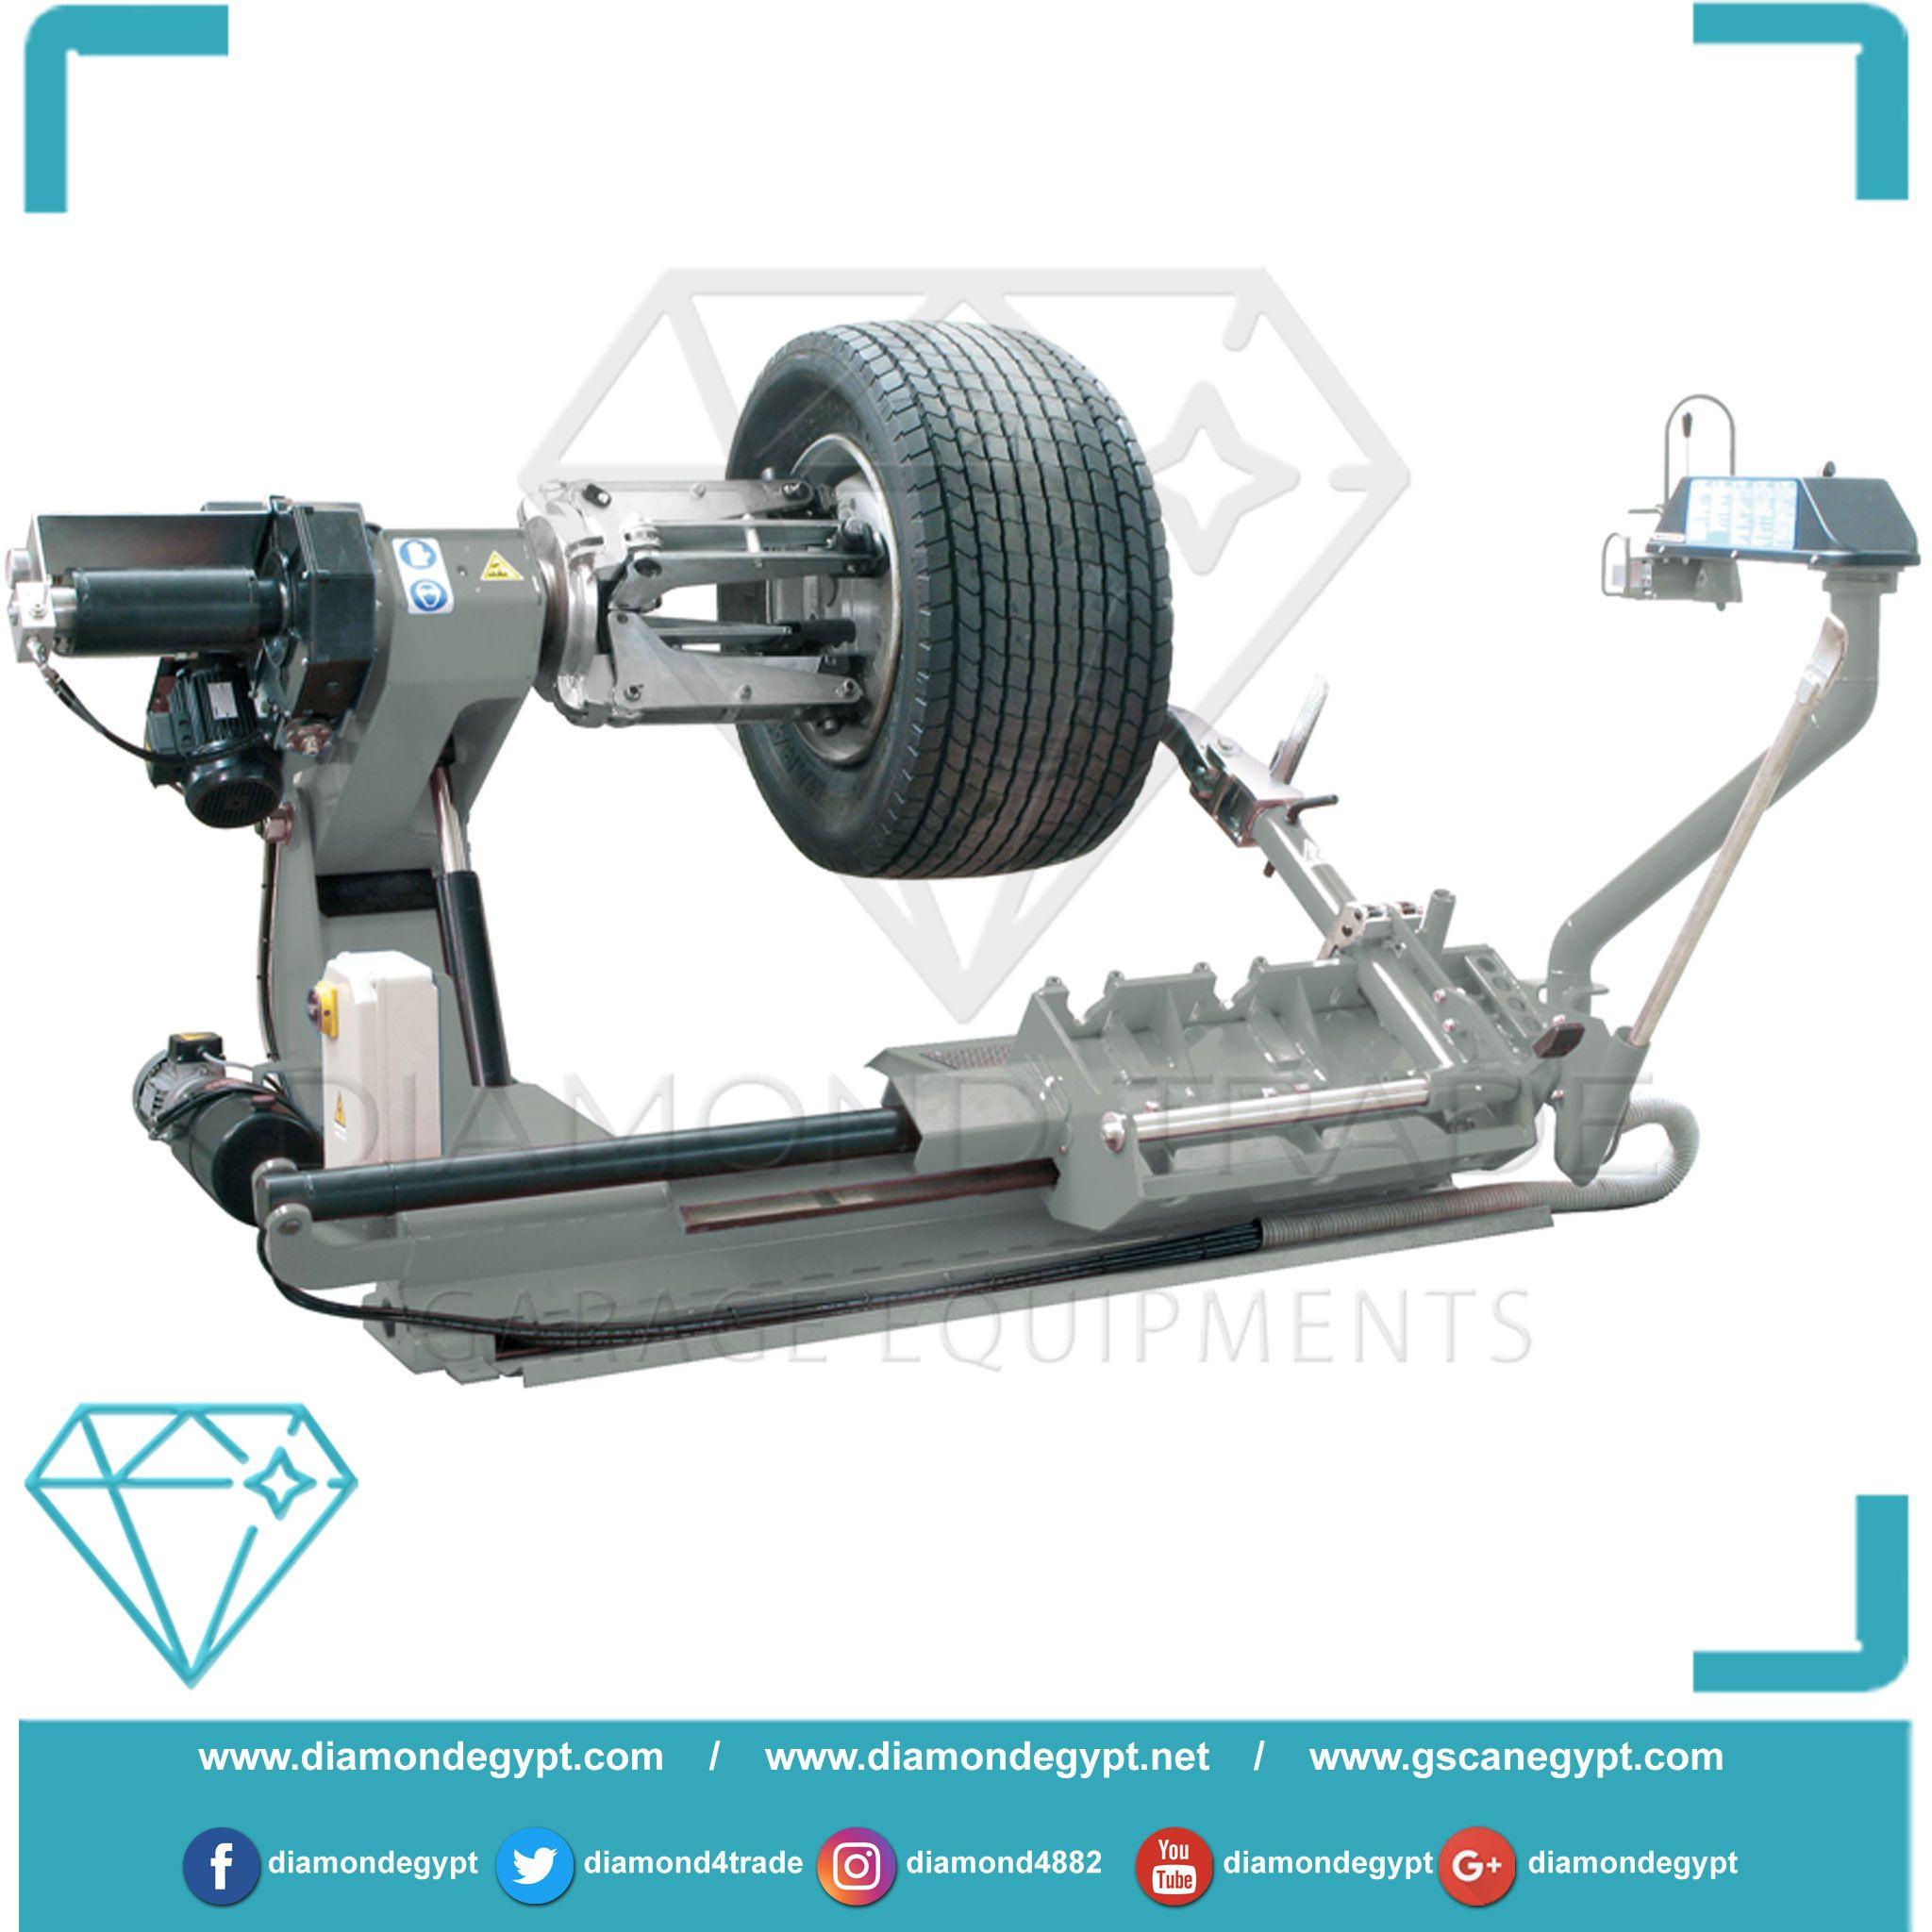 Gg30156 11n ماكينه فك وتركيب نقل ثقيل Row Machine Gym Equipment Gym